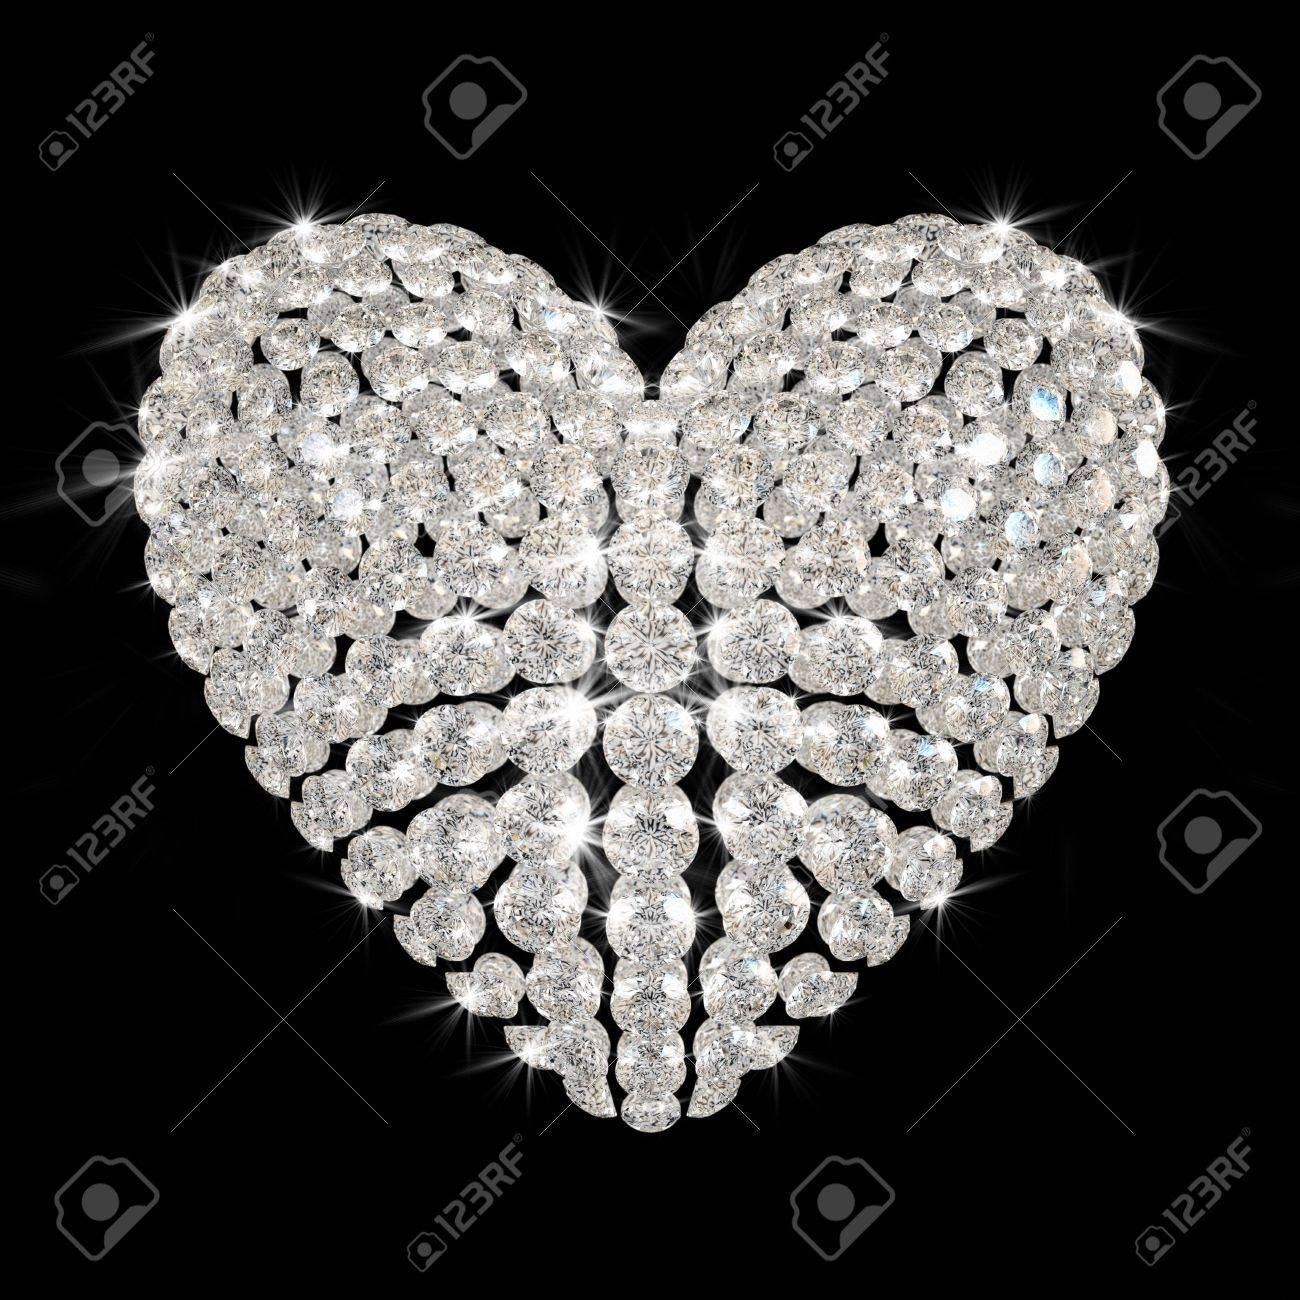 diamond's heart isolated on black background - 3d render. Stock Photo - 8528893